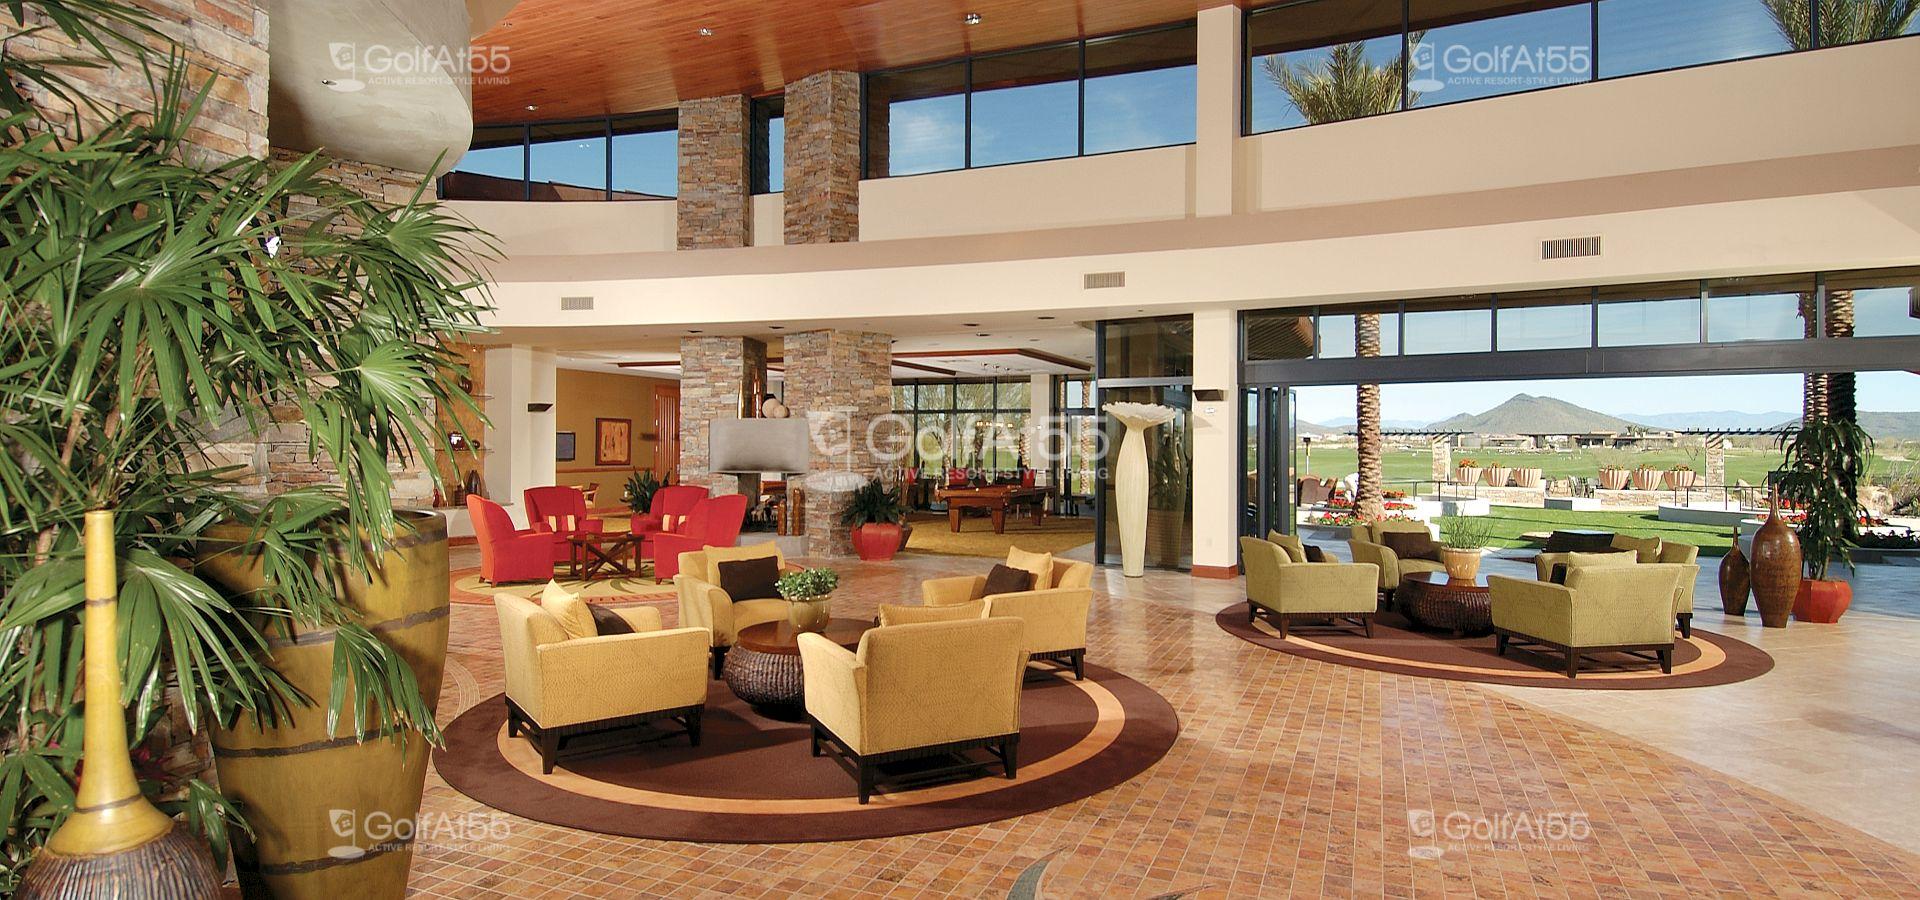 trilogy at vistancia homes for sale real estate